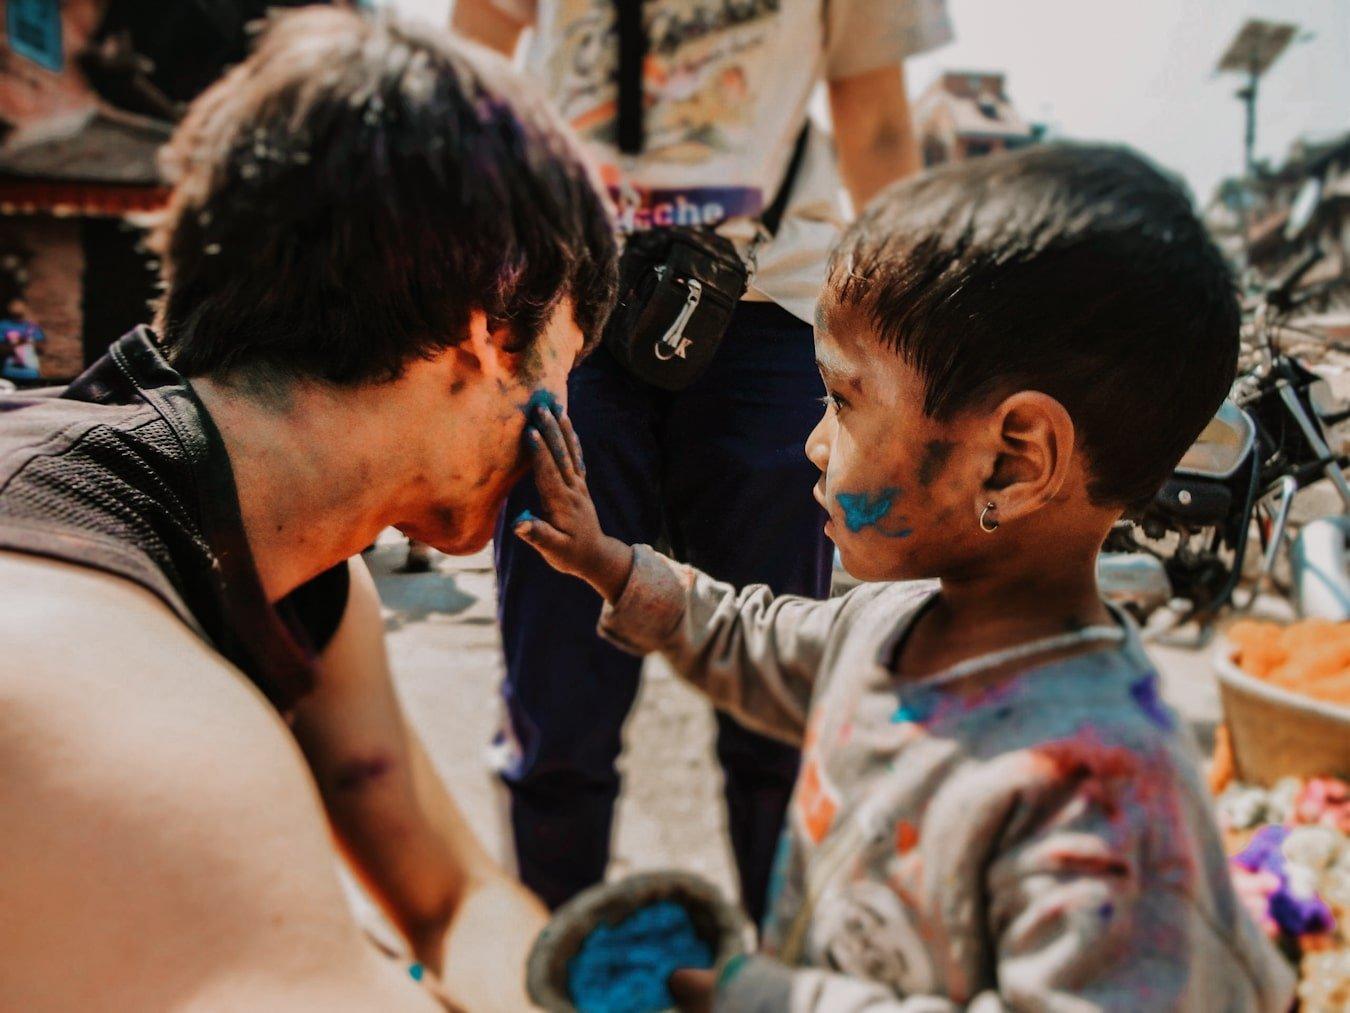 boy putting holi powder on foreigner in kathmandu nepal during the holi festival